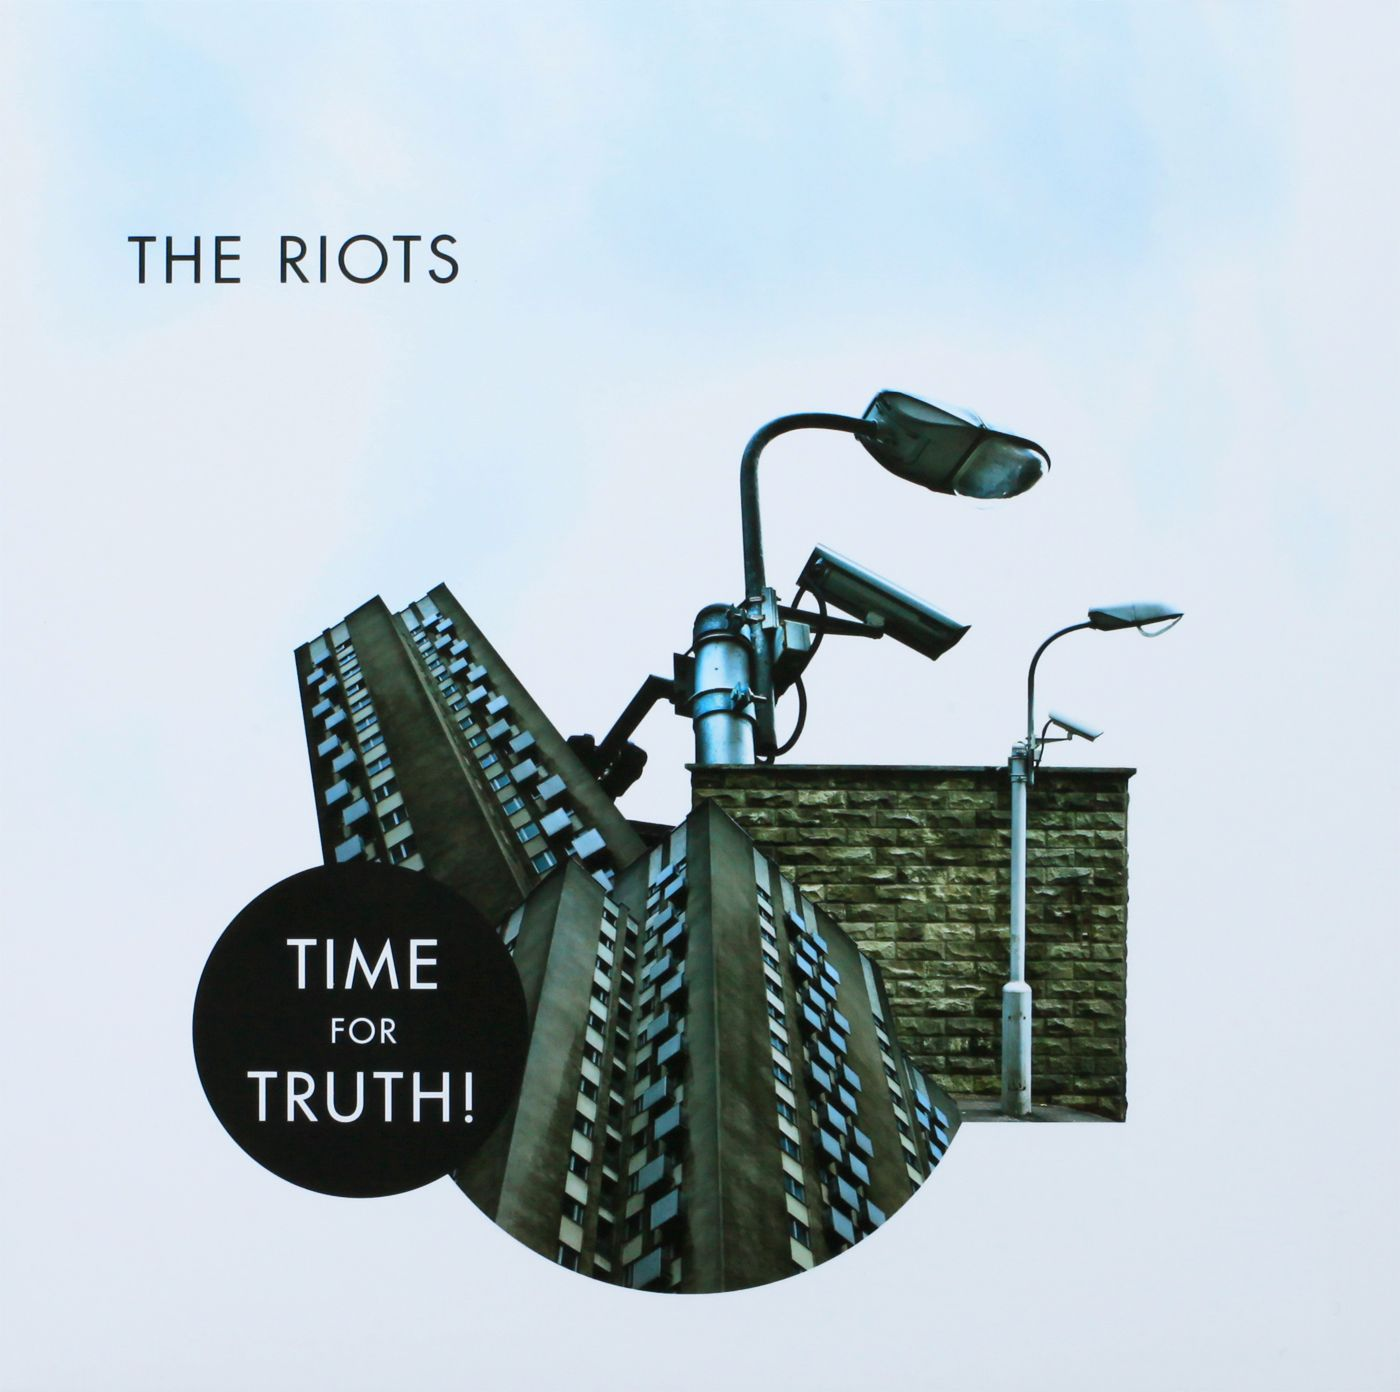 http://turbid.biz/index_files/original_images/the_riots/time_for_truth/p0000001.jpg